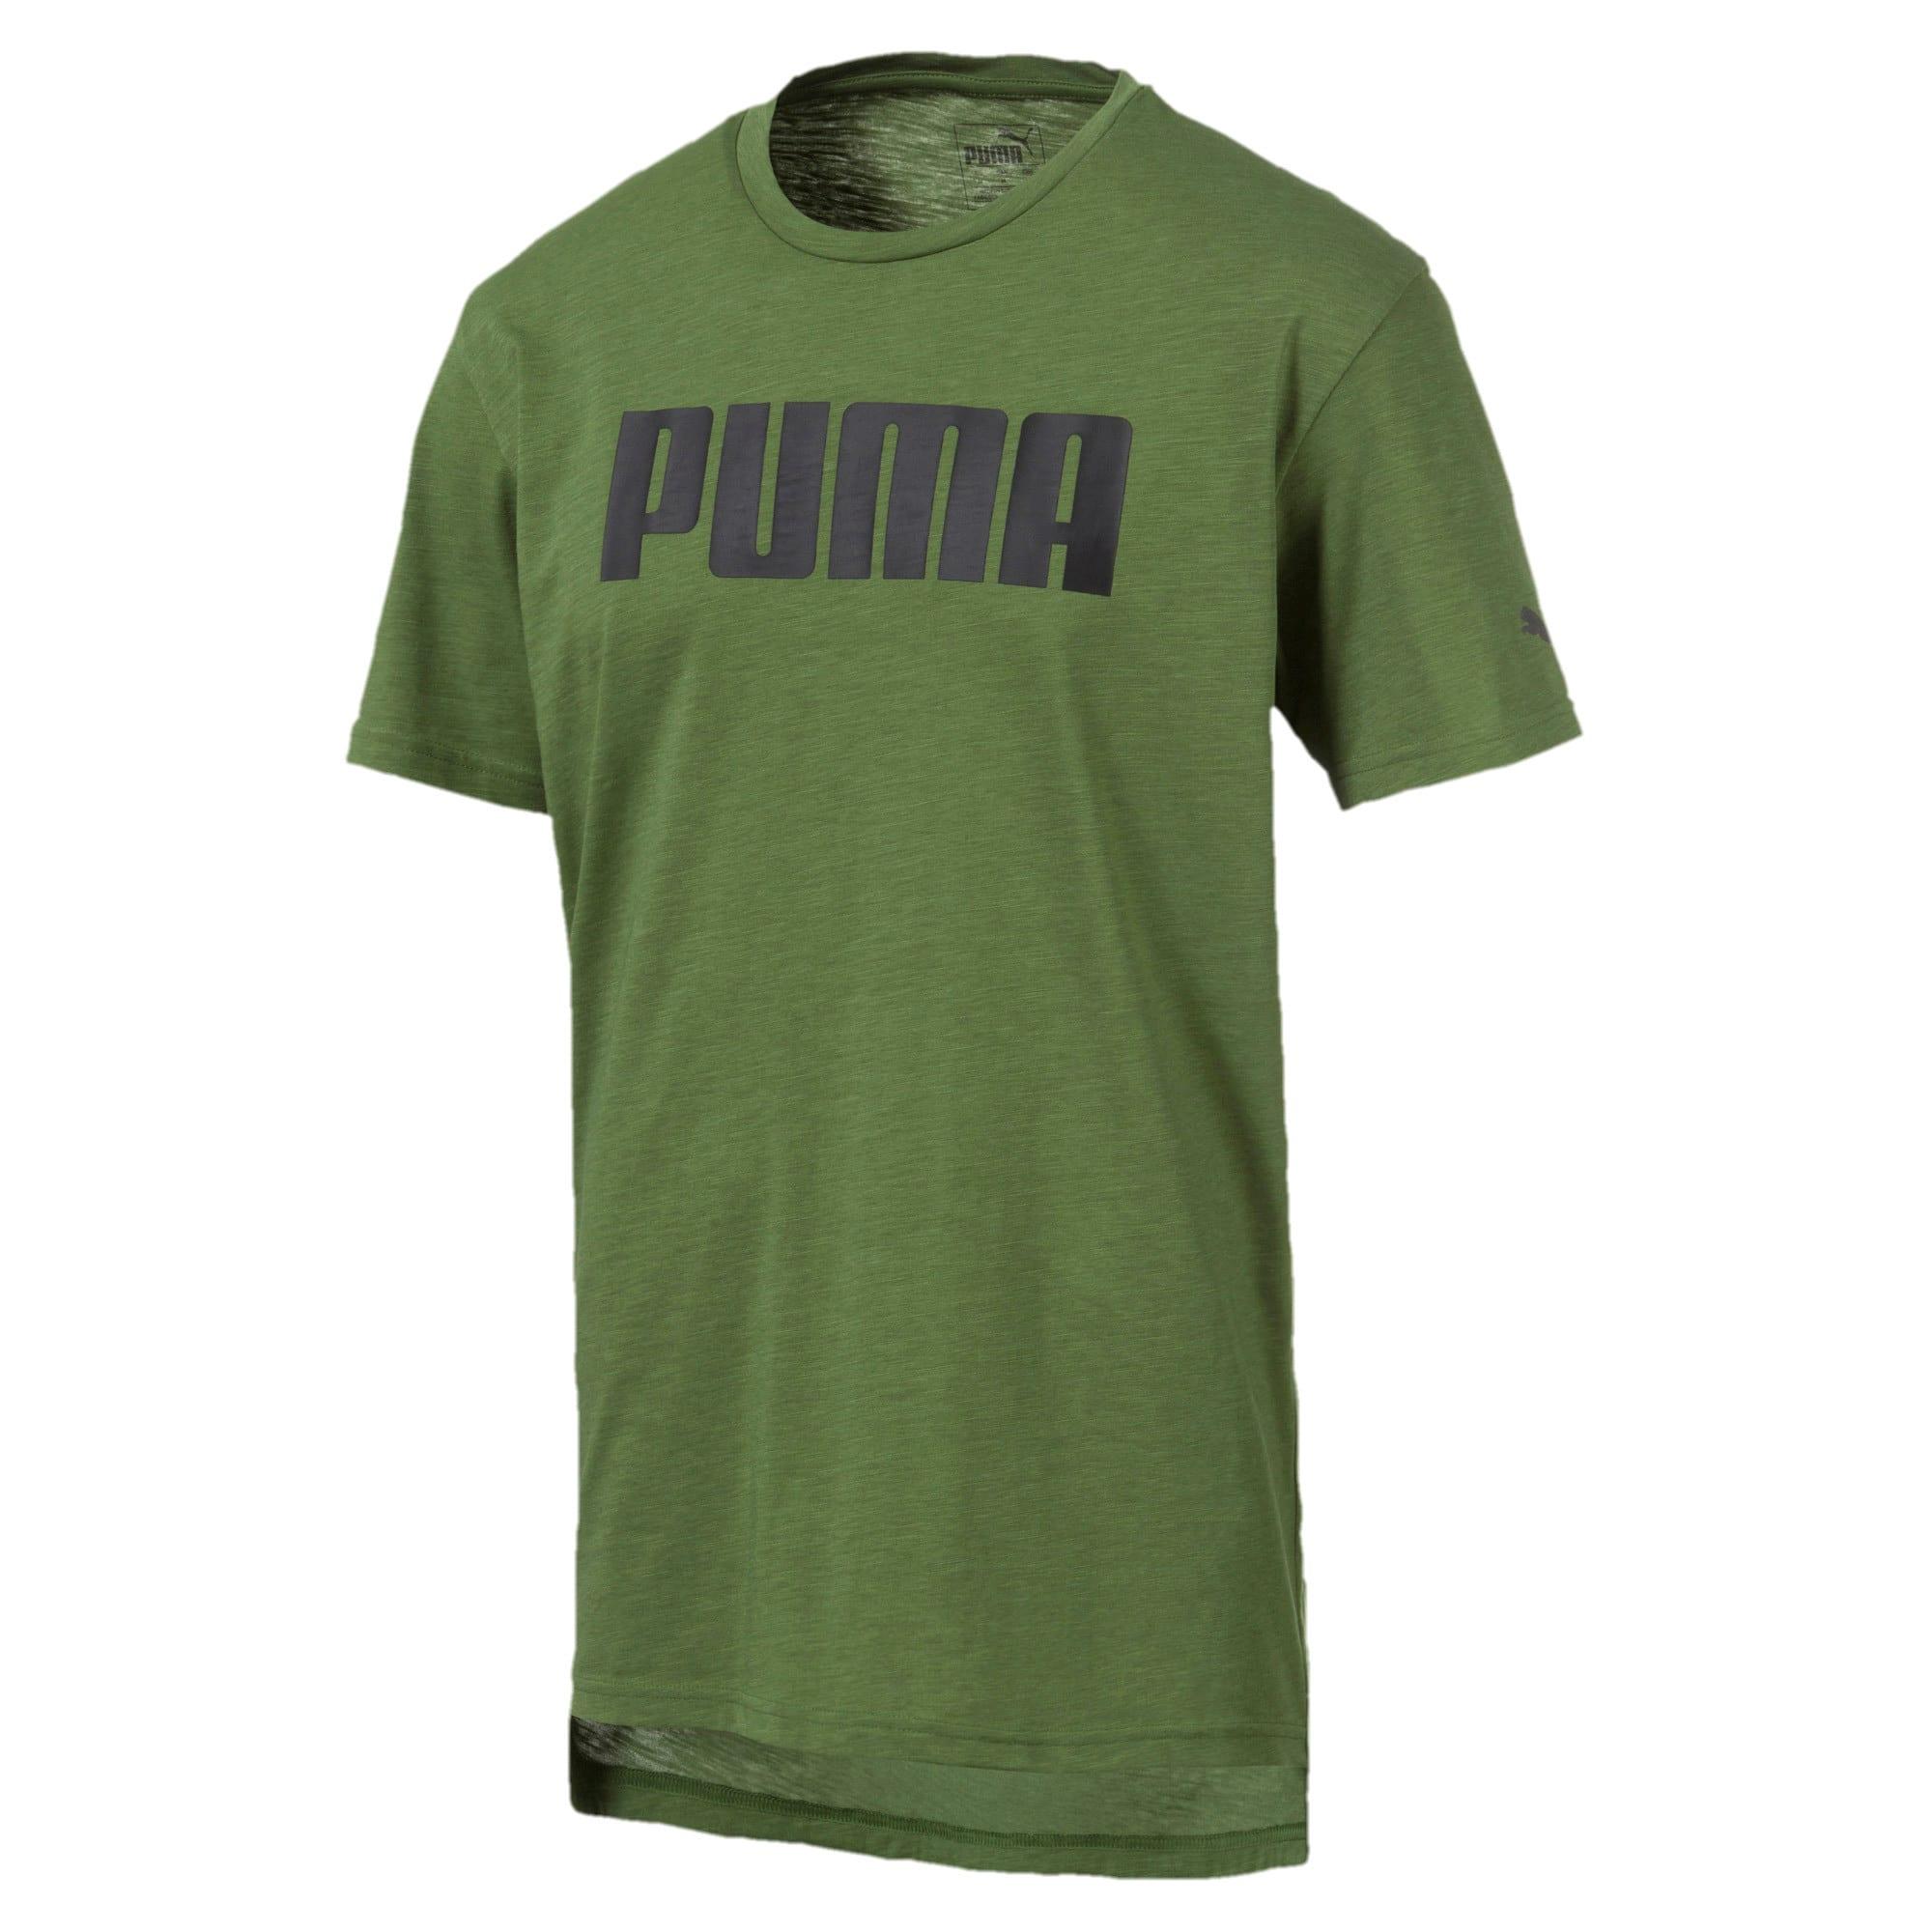 Thumbnail 1 of PUMA Men's Graphic Tee, Garden Green Heather, medium